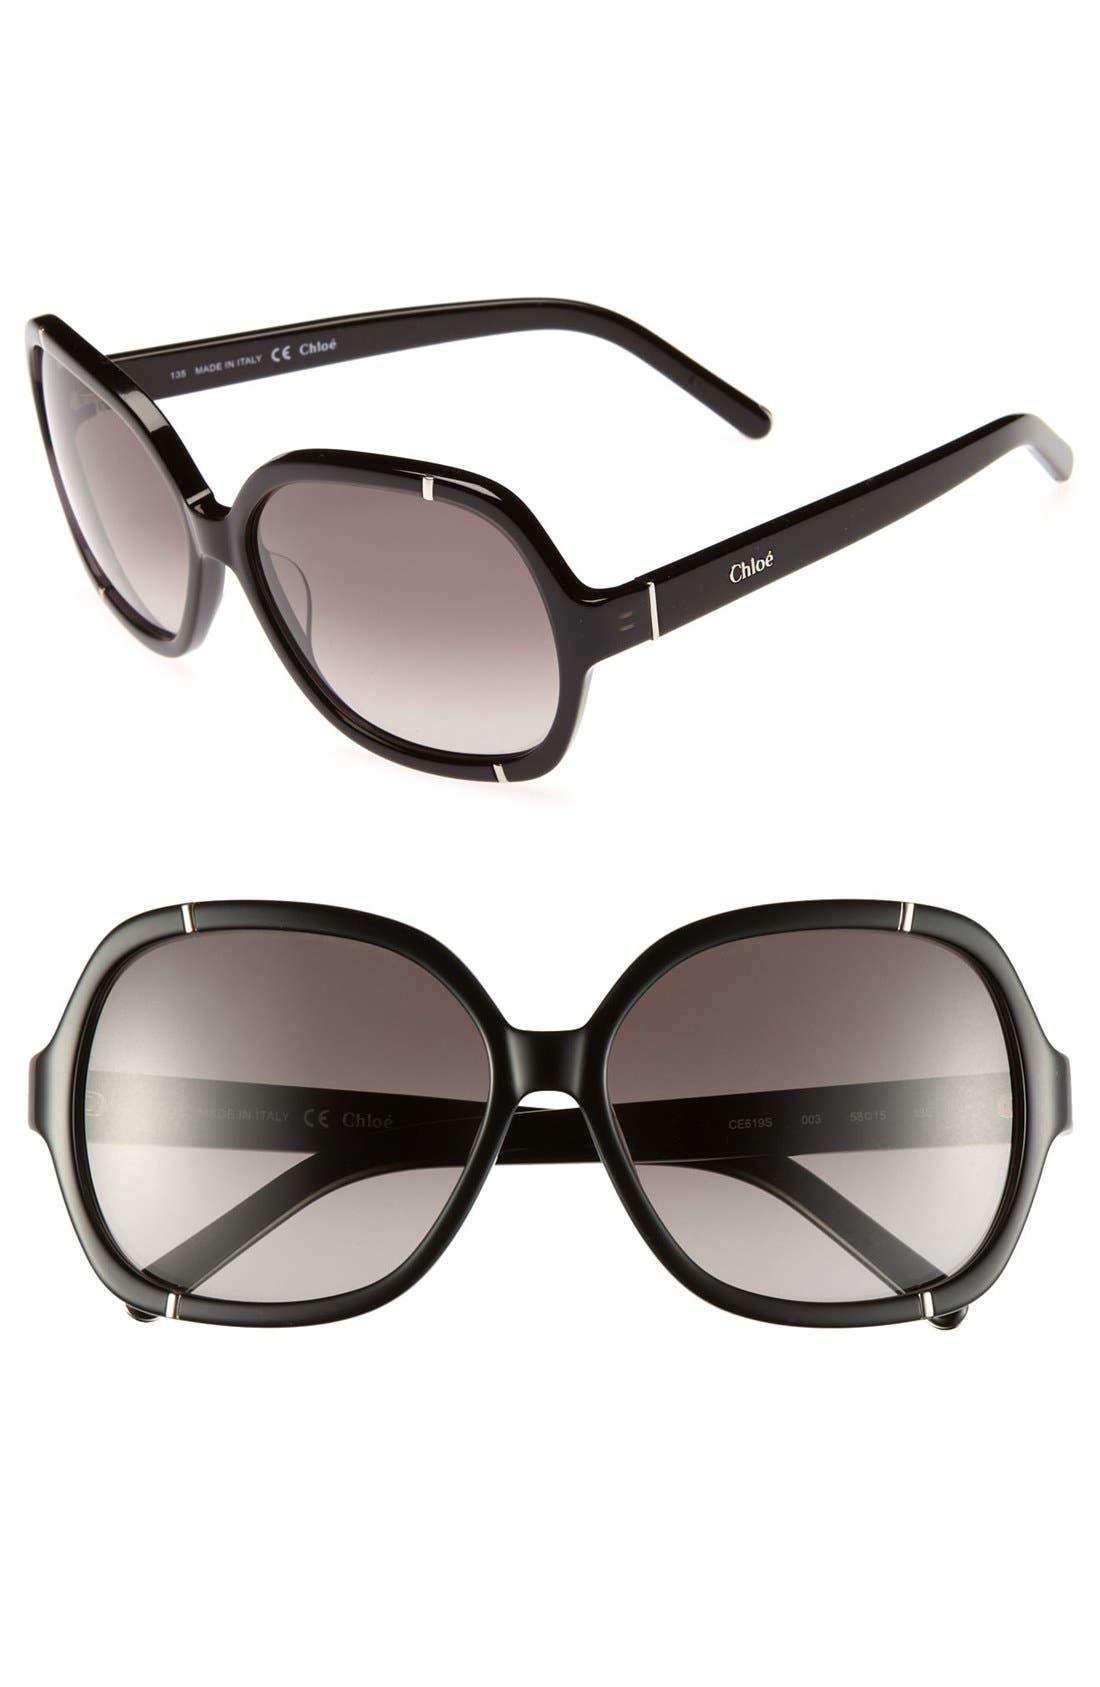 Alternate Image 1 Selected - Chloé 'Caspia' 58mm Sunglasses